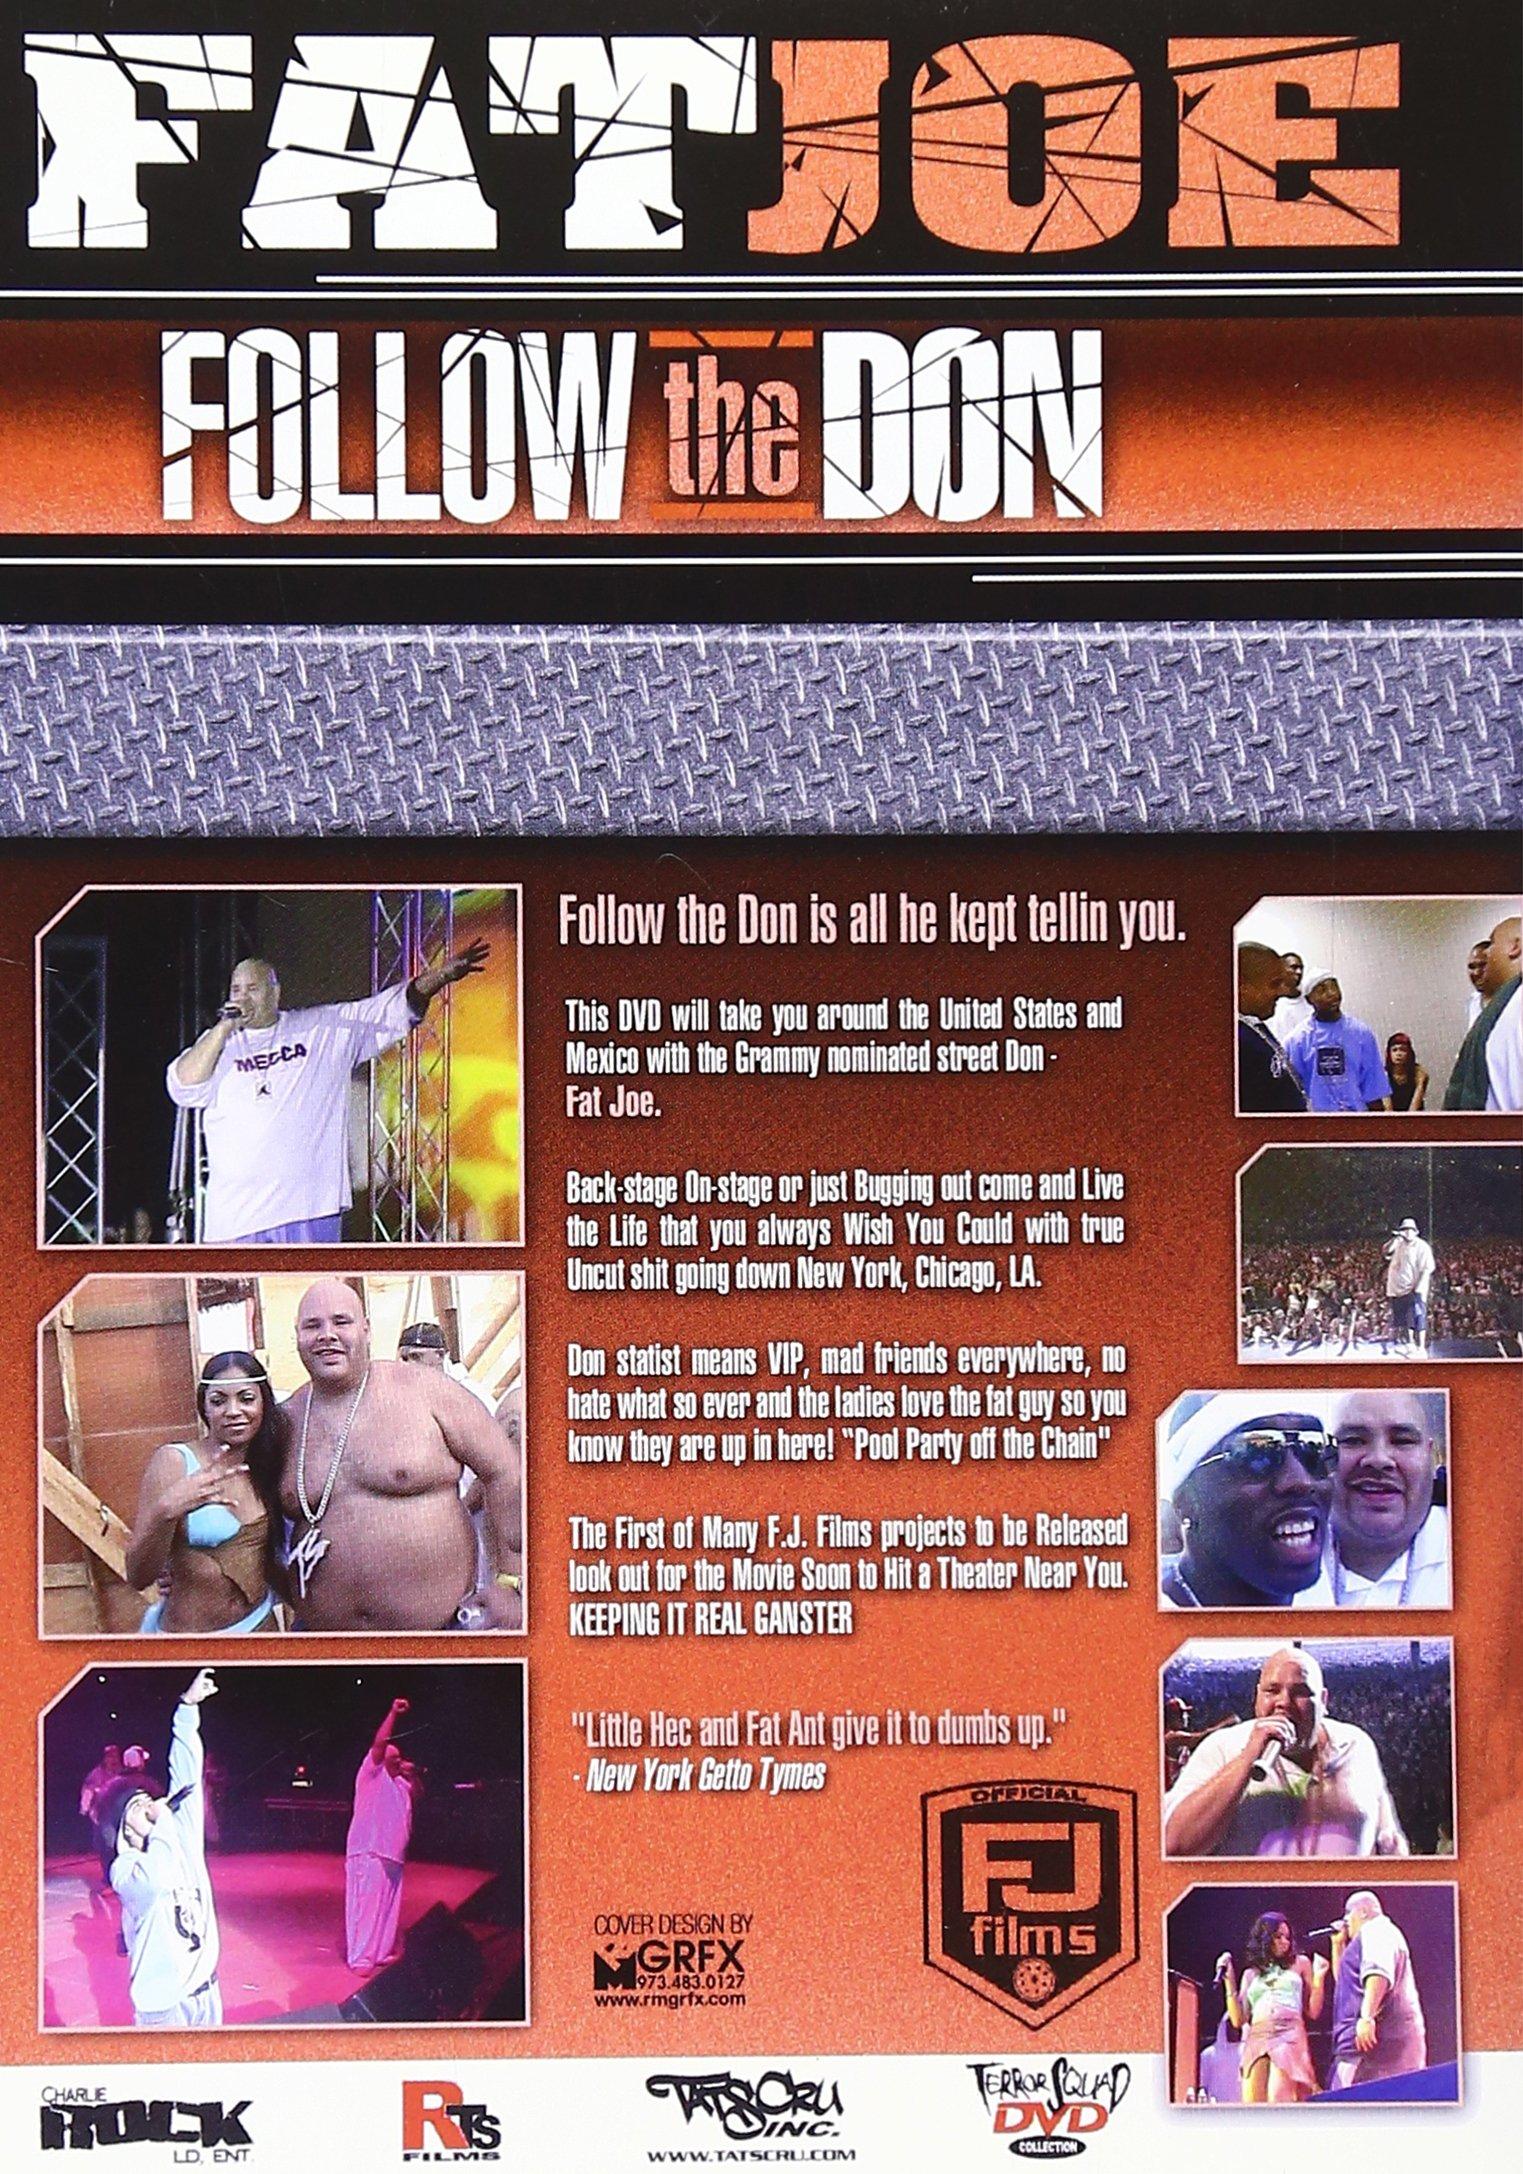 Fat Joe: Follow the Don by FJ FILMS/TRAFFI